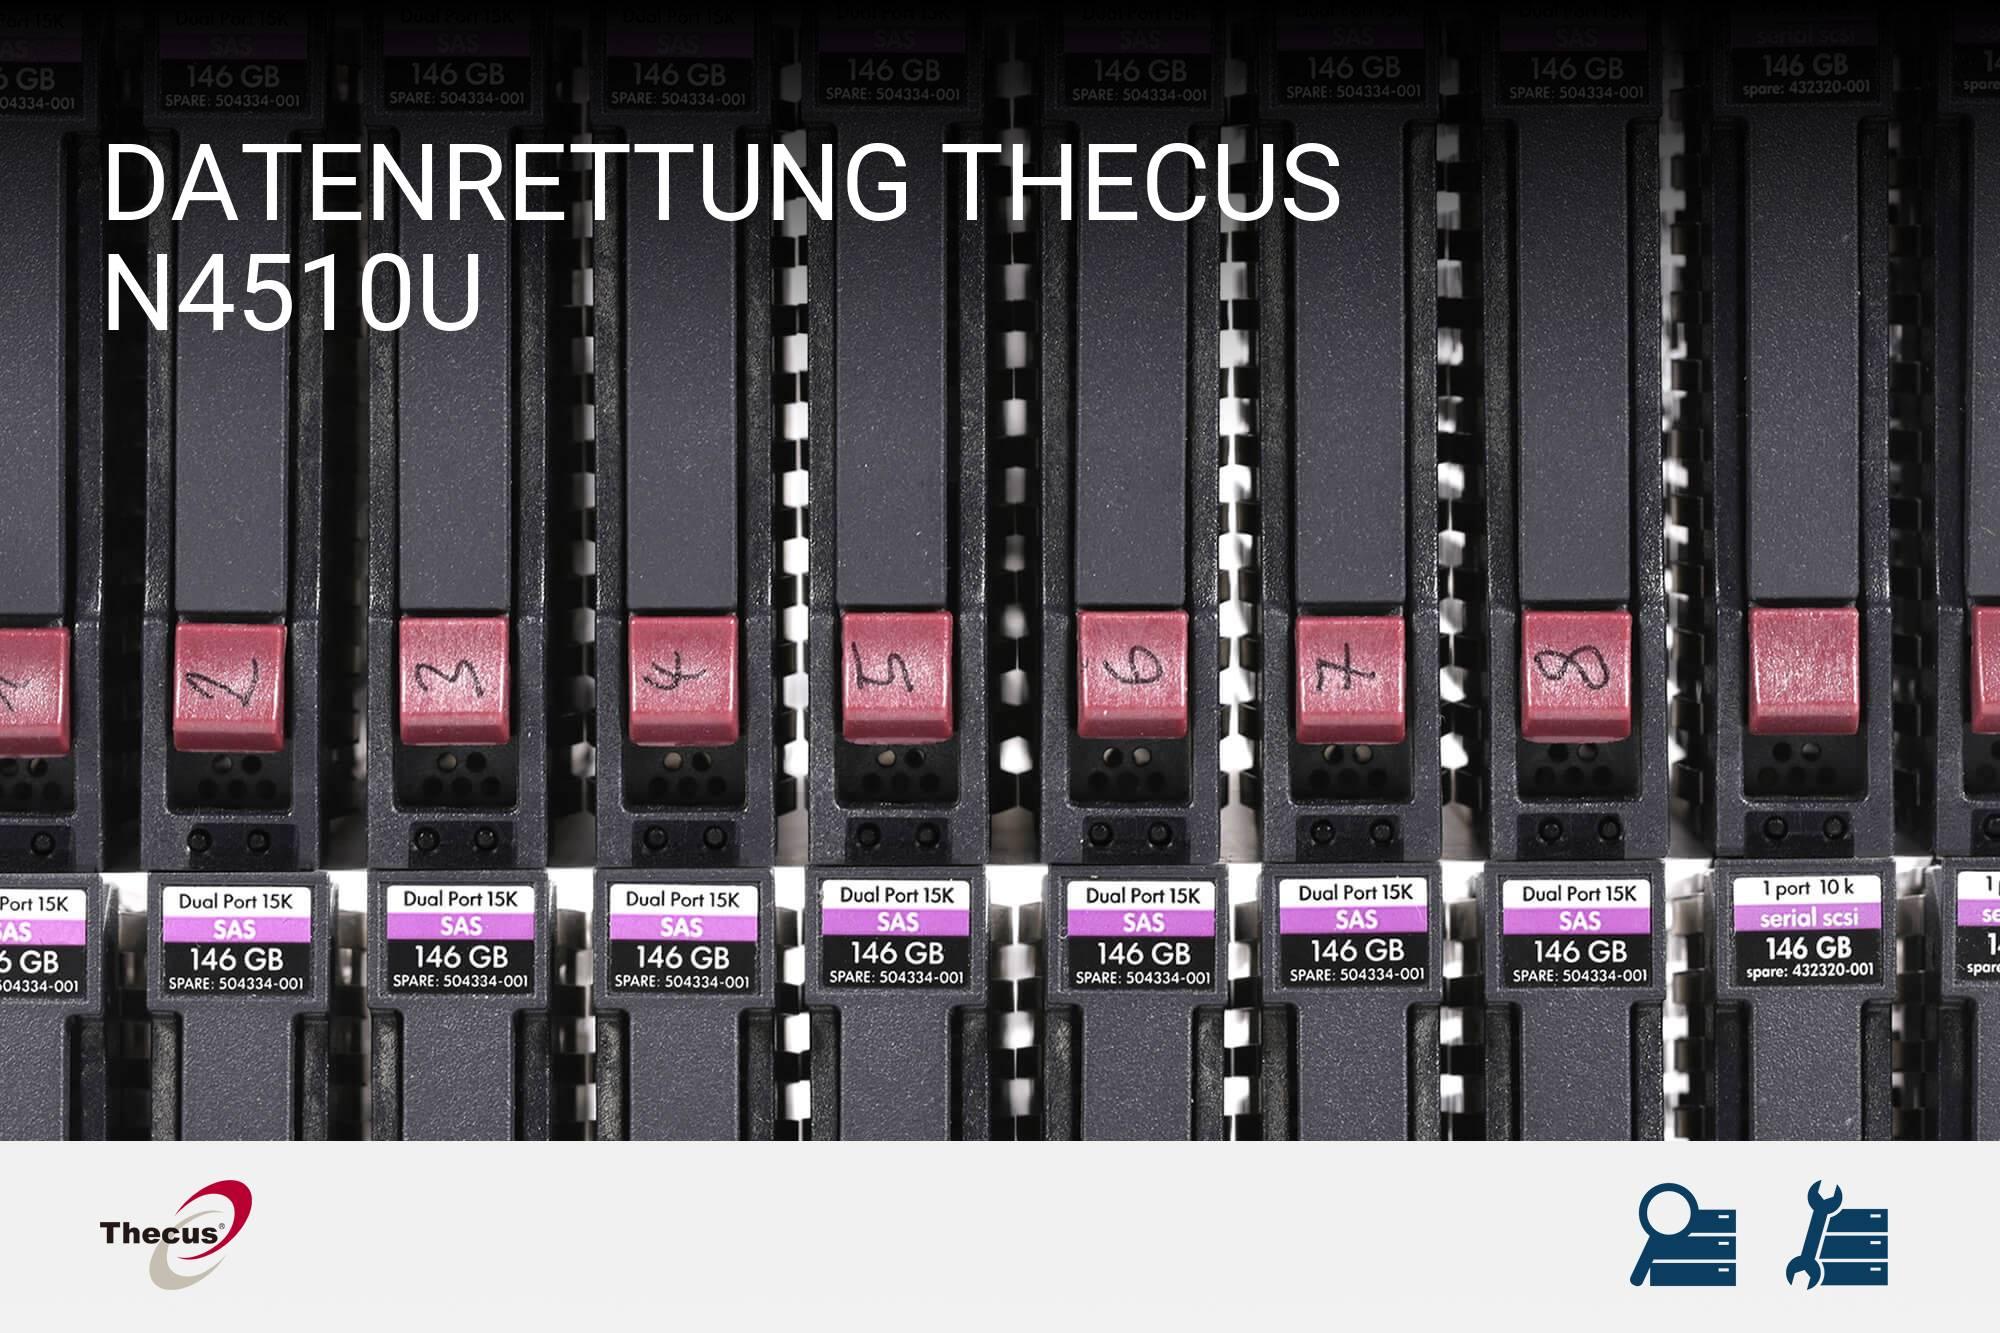 Thecus N4510U